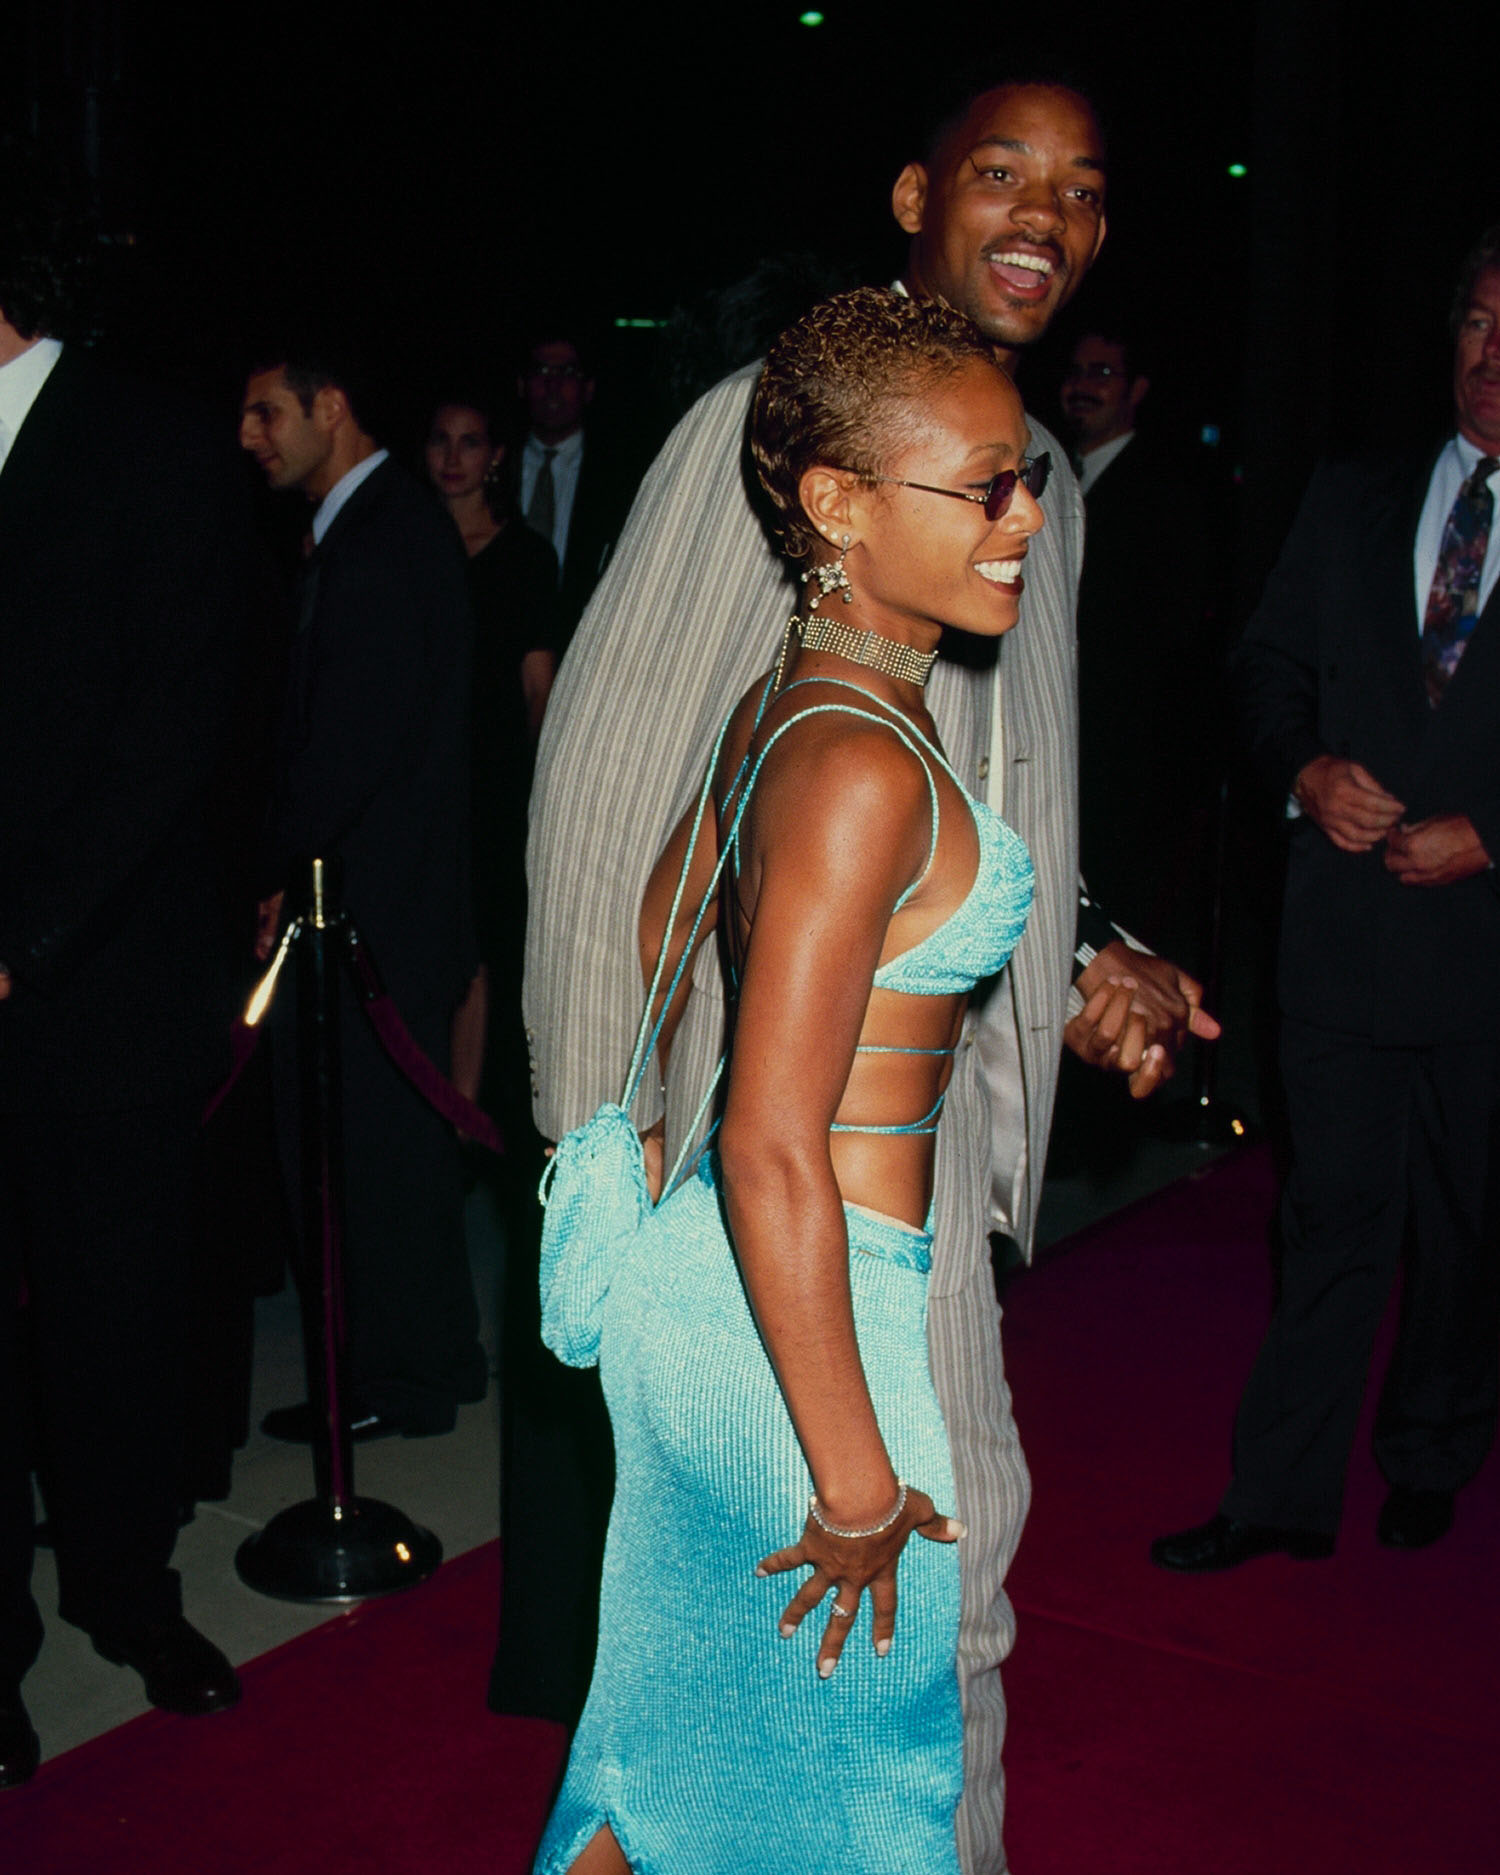 Will Smith and Jada Pinkett Smith | Stars' Stunning ... |Will Smith Jada Pinkett Wedding Dress